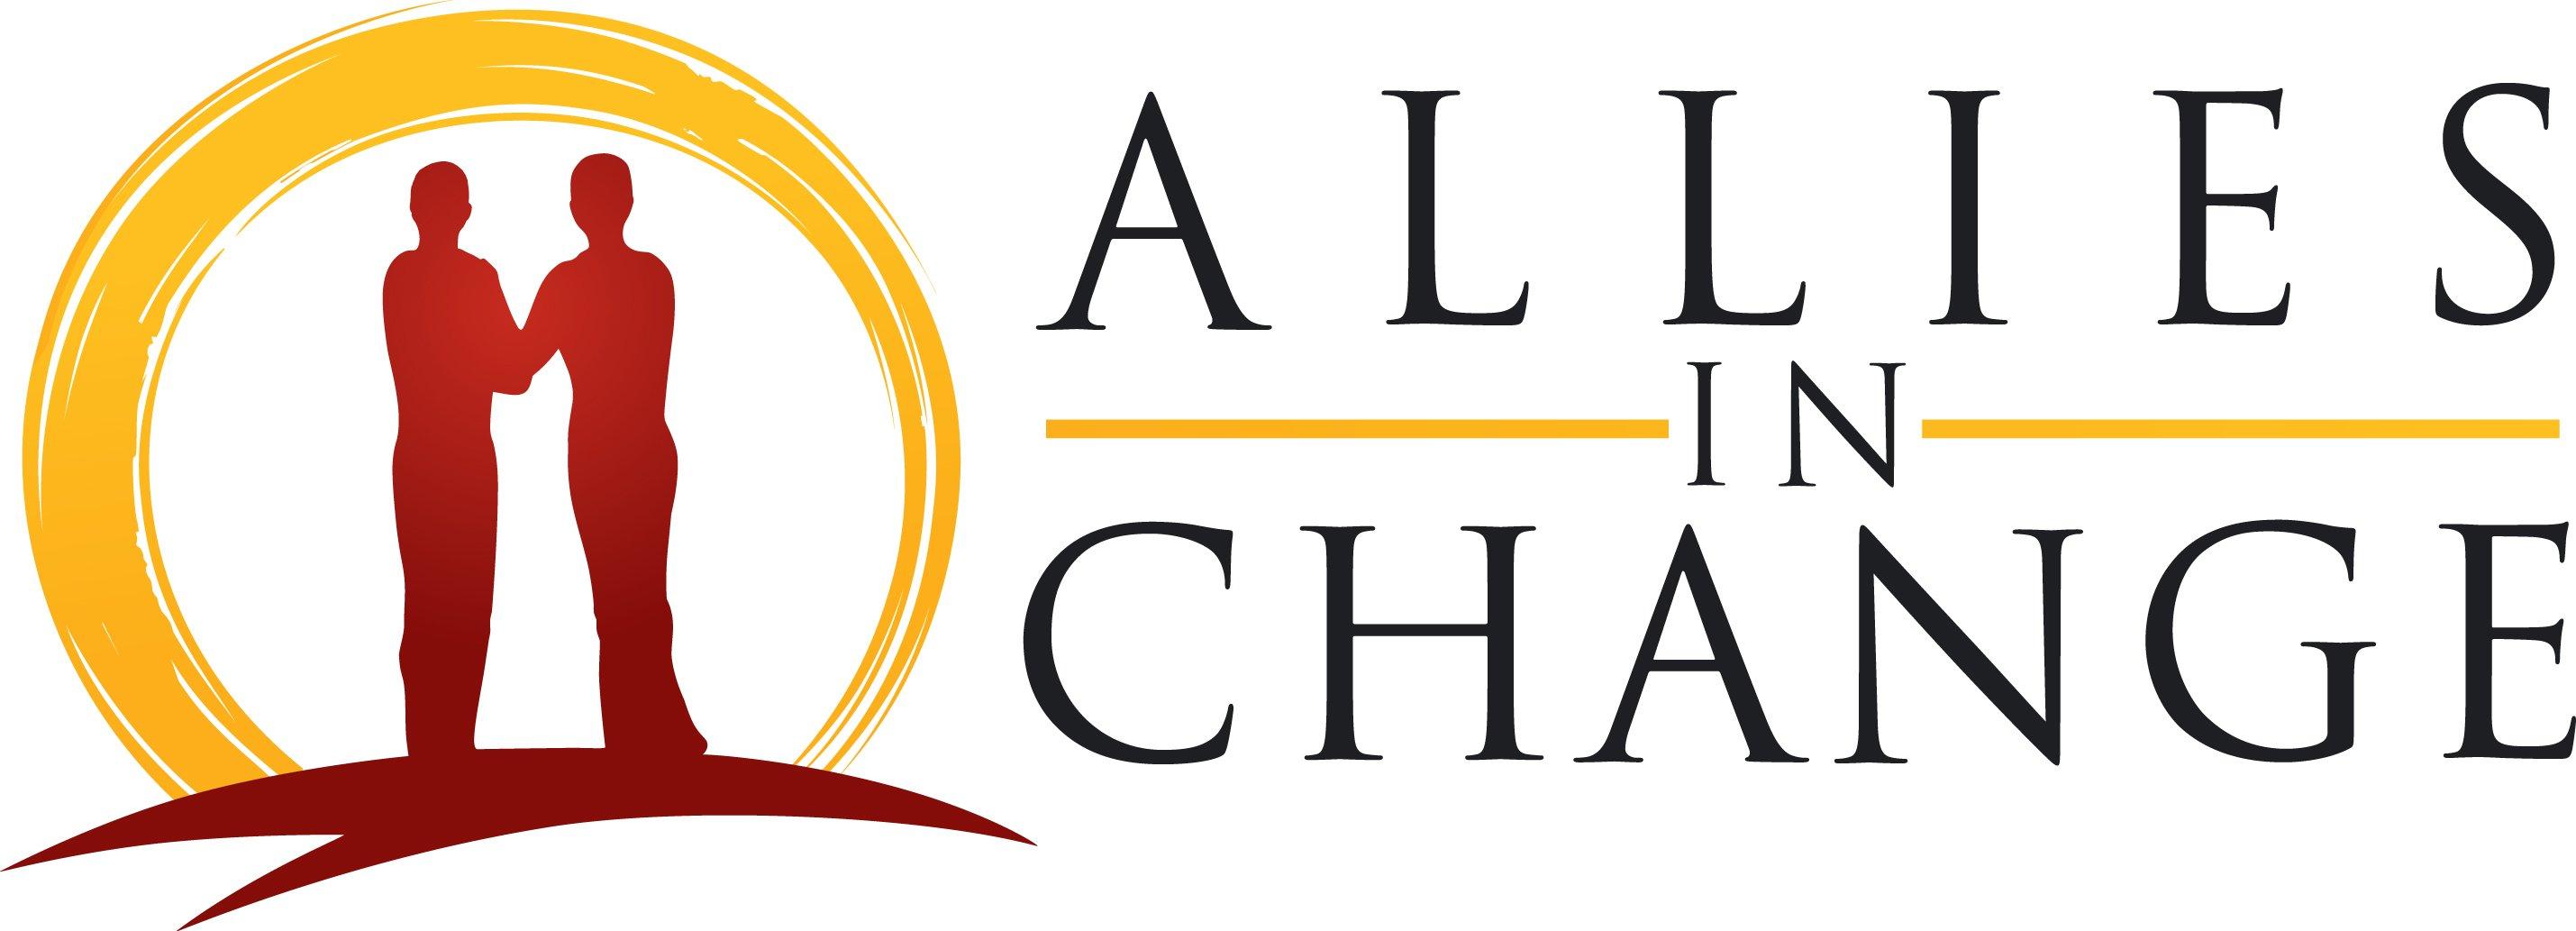 Allies in Change logo